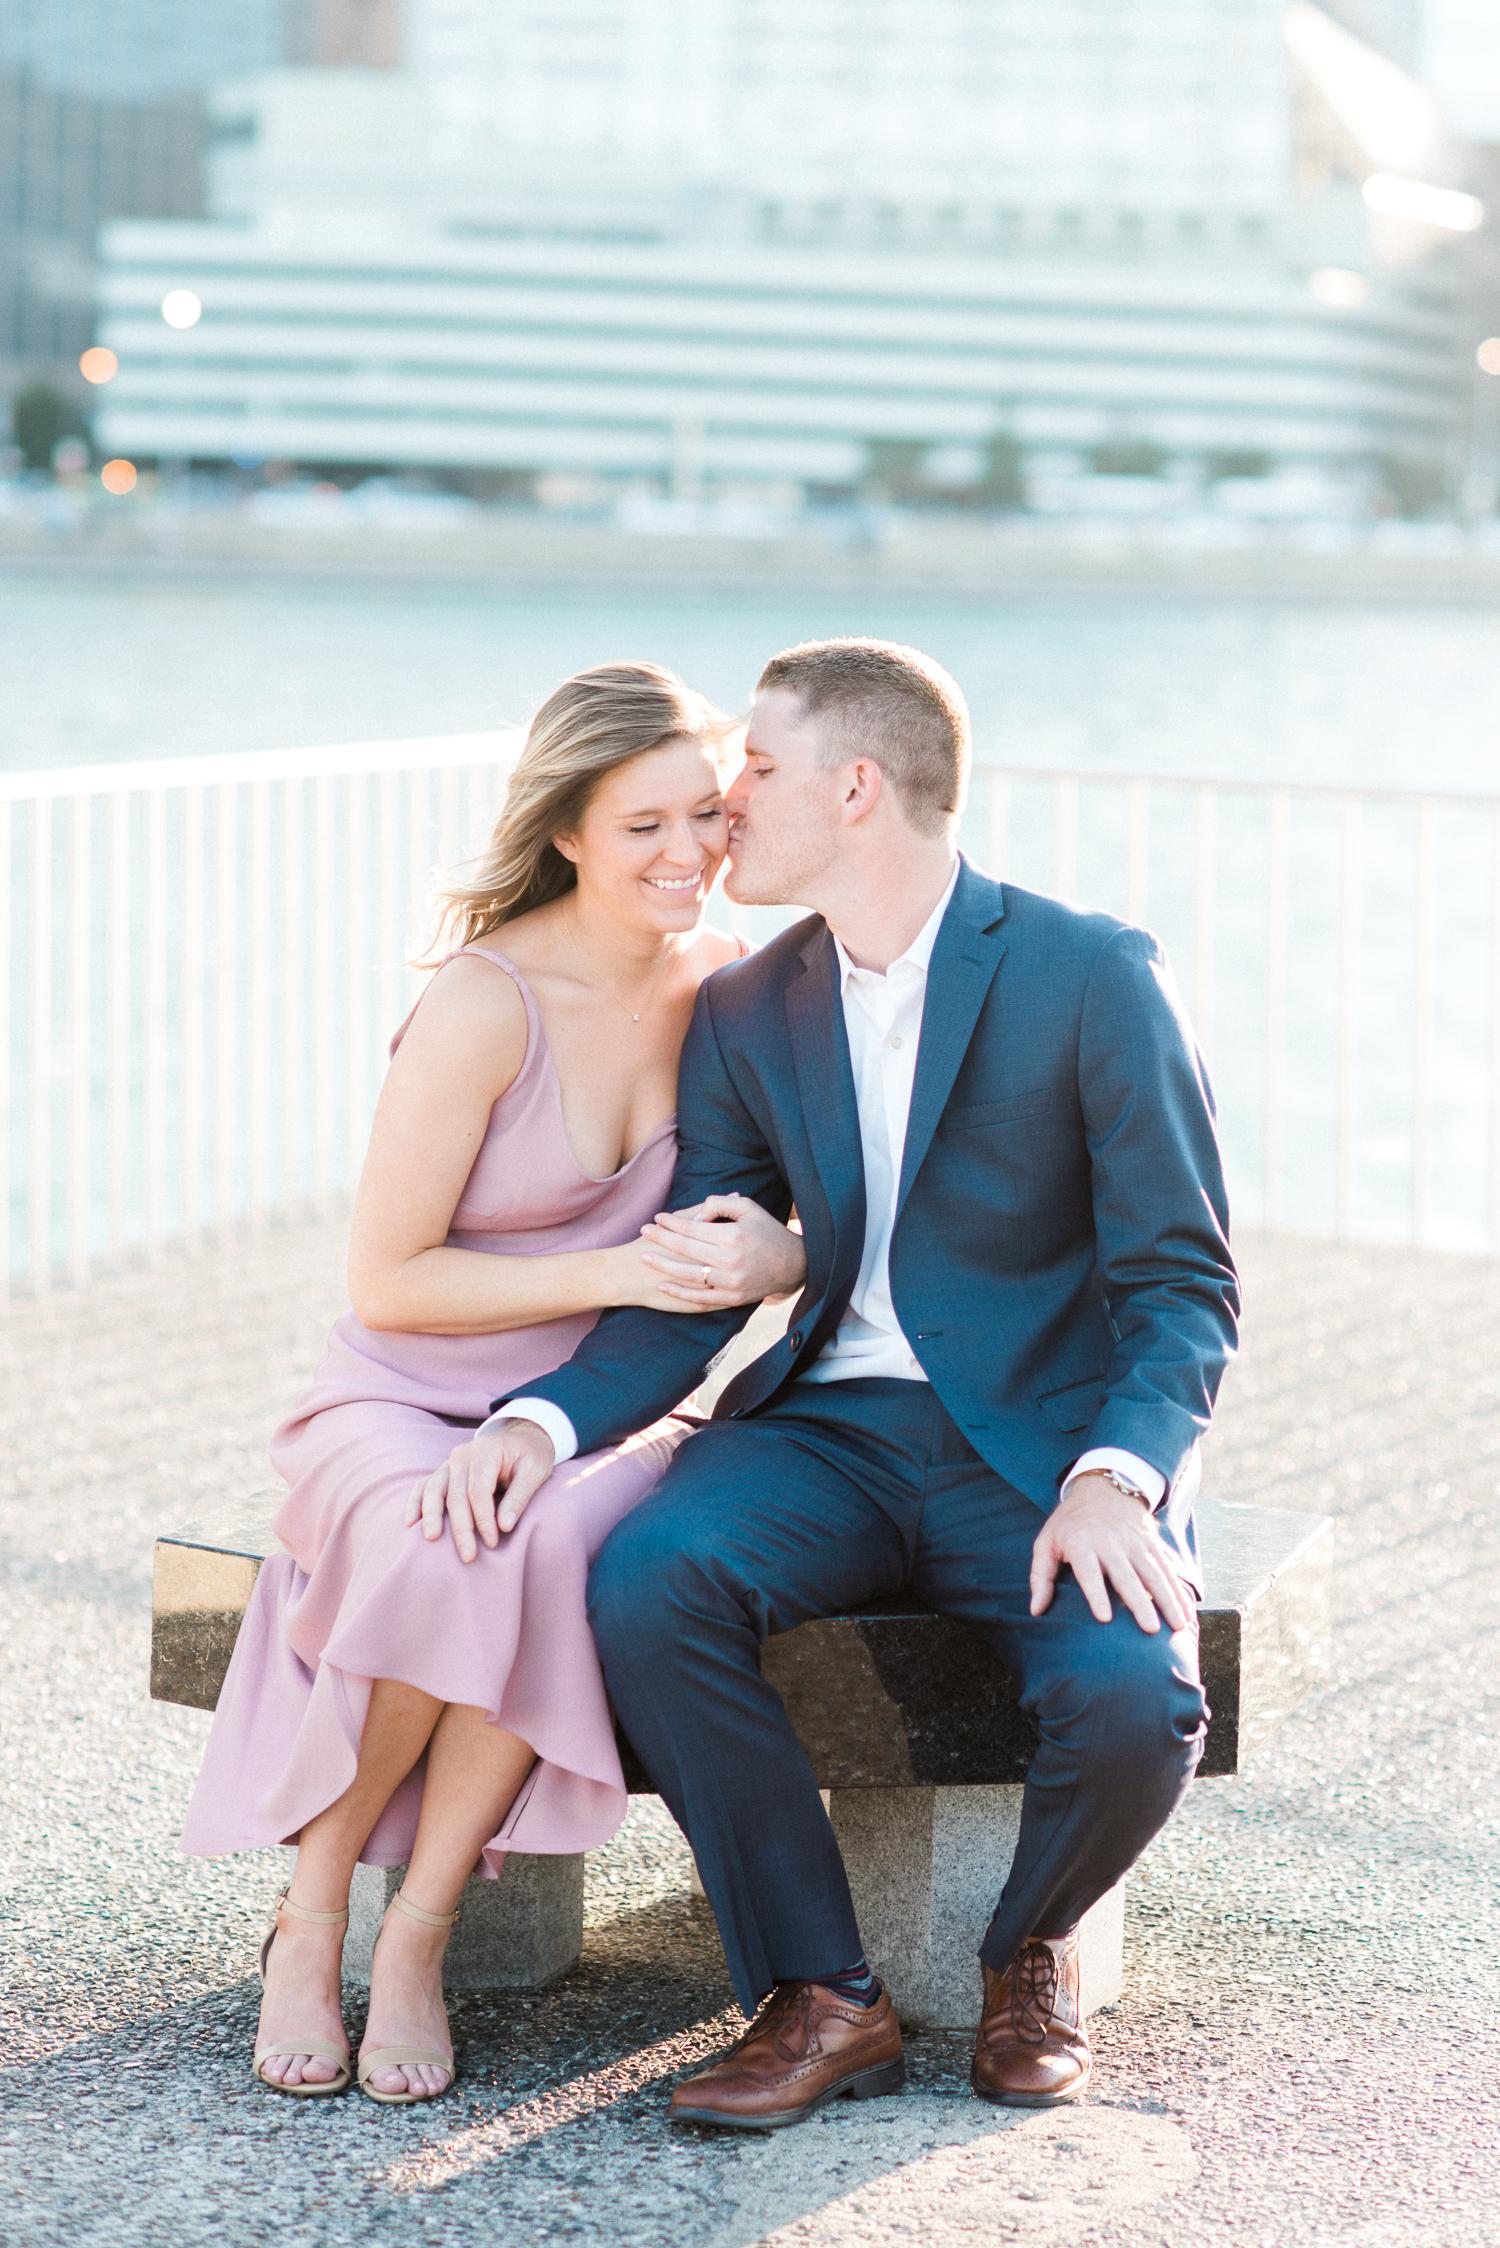 Brittany Bekas - Chicago Las Vegas Engagement Photographer-28.jpg